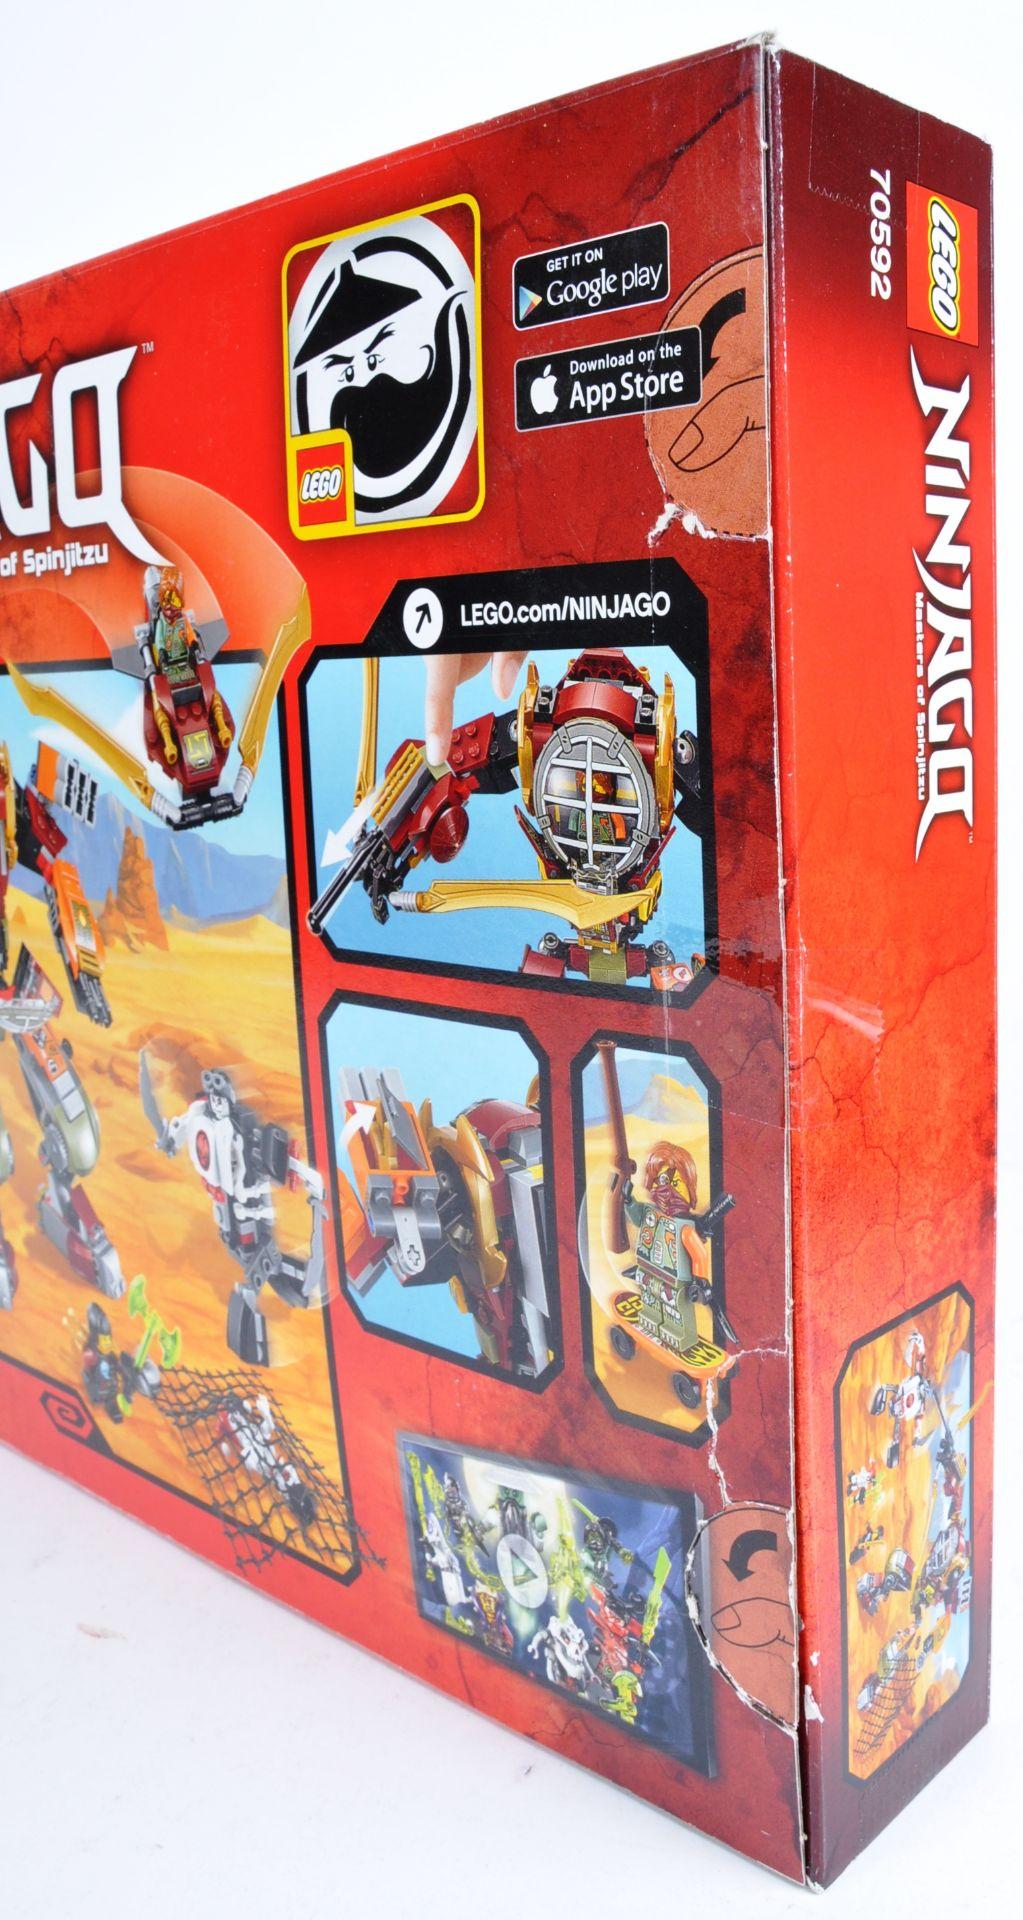 LEGO SETS - LEGO NINJAGO - 70589 / 70592 / 70746 / 70748 - Image 9 of 10